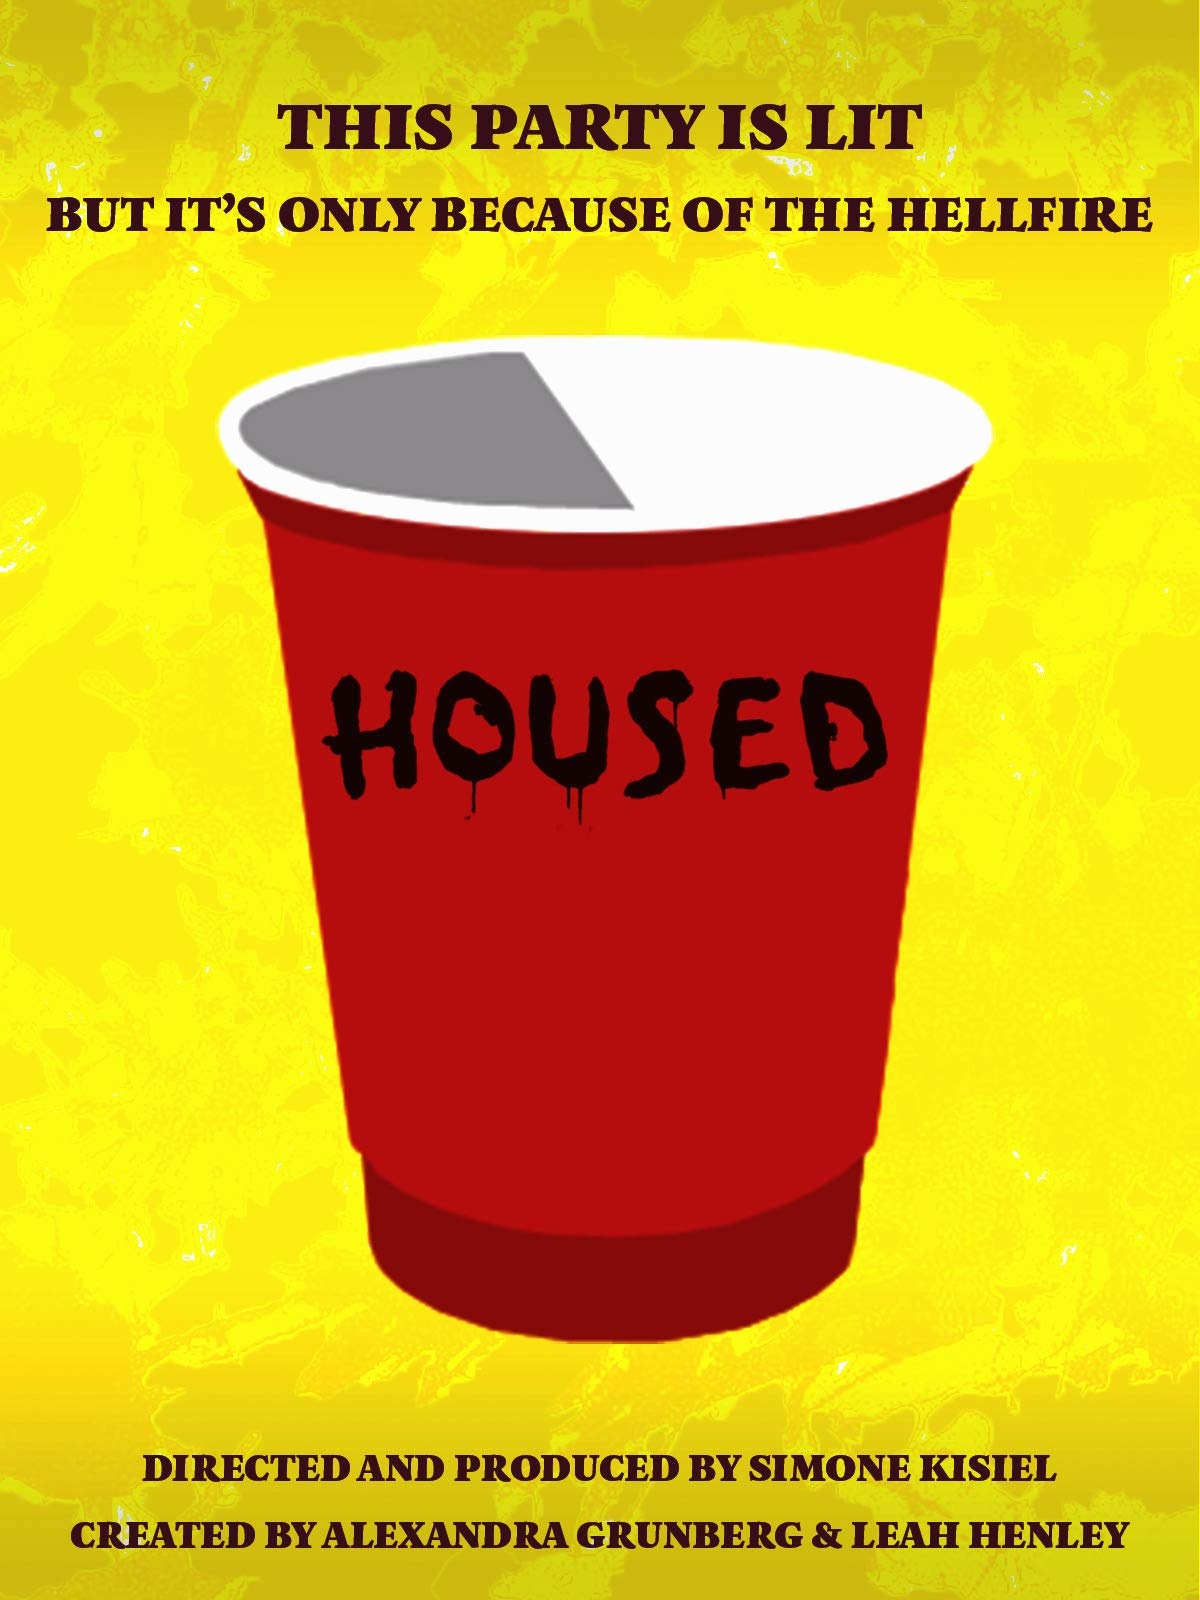 Housed